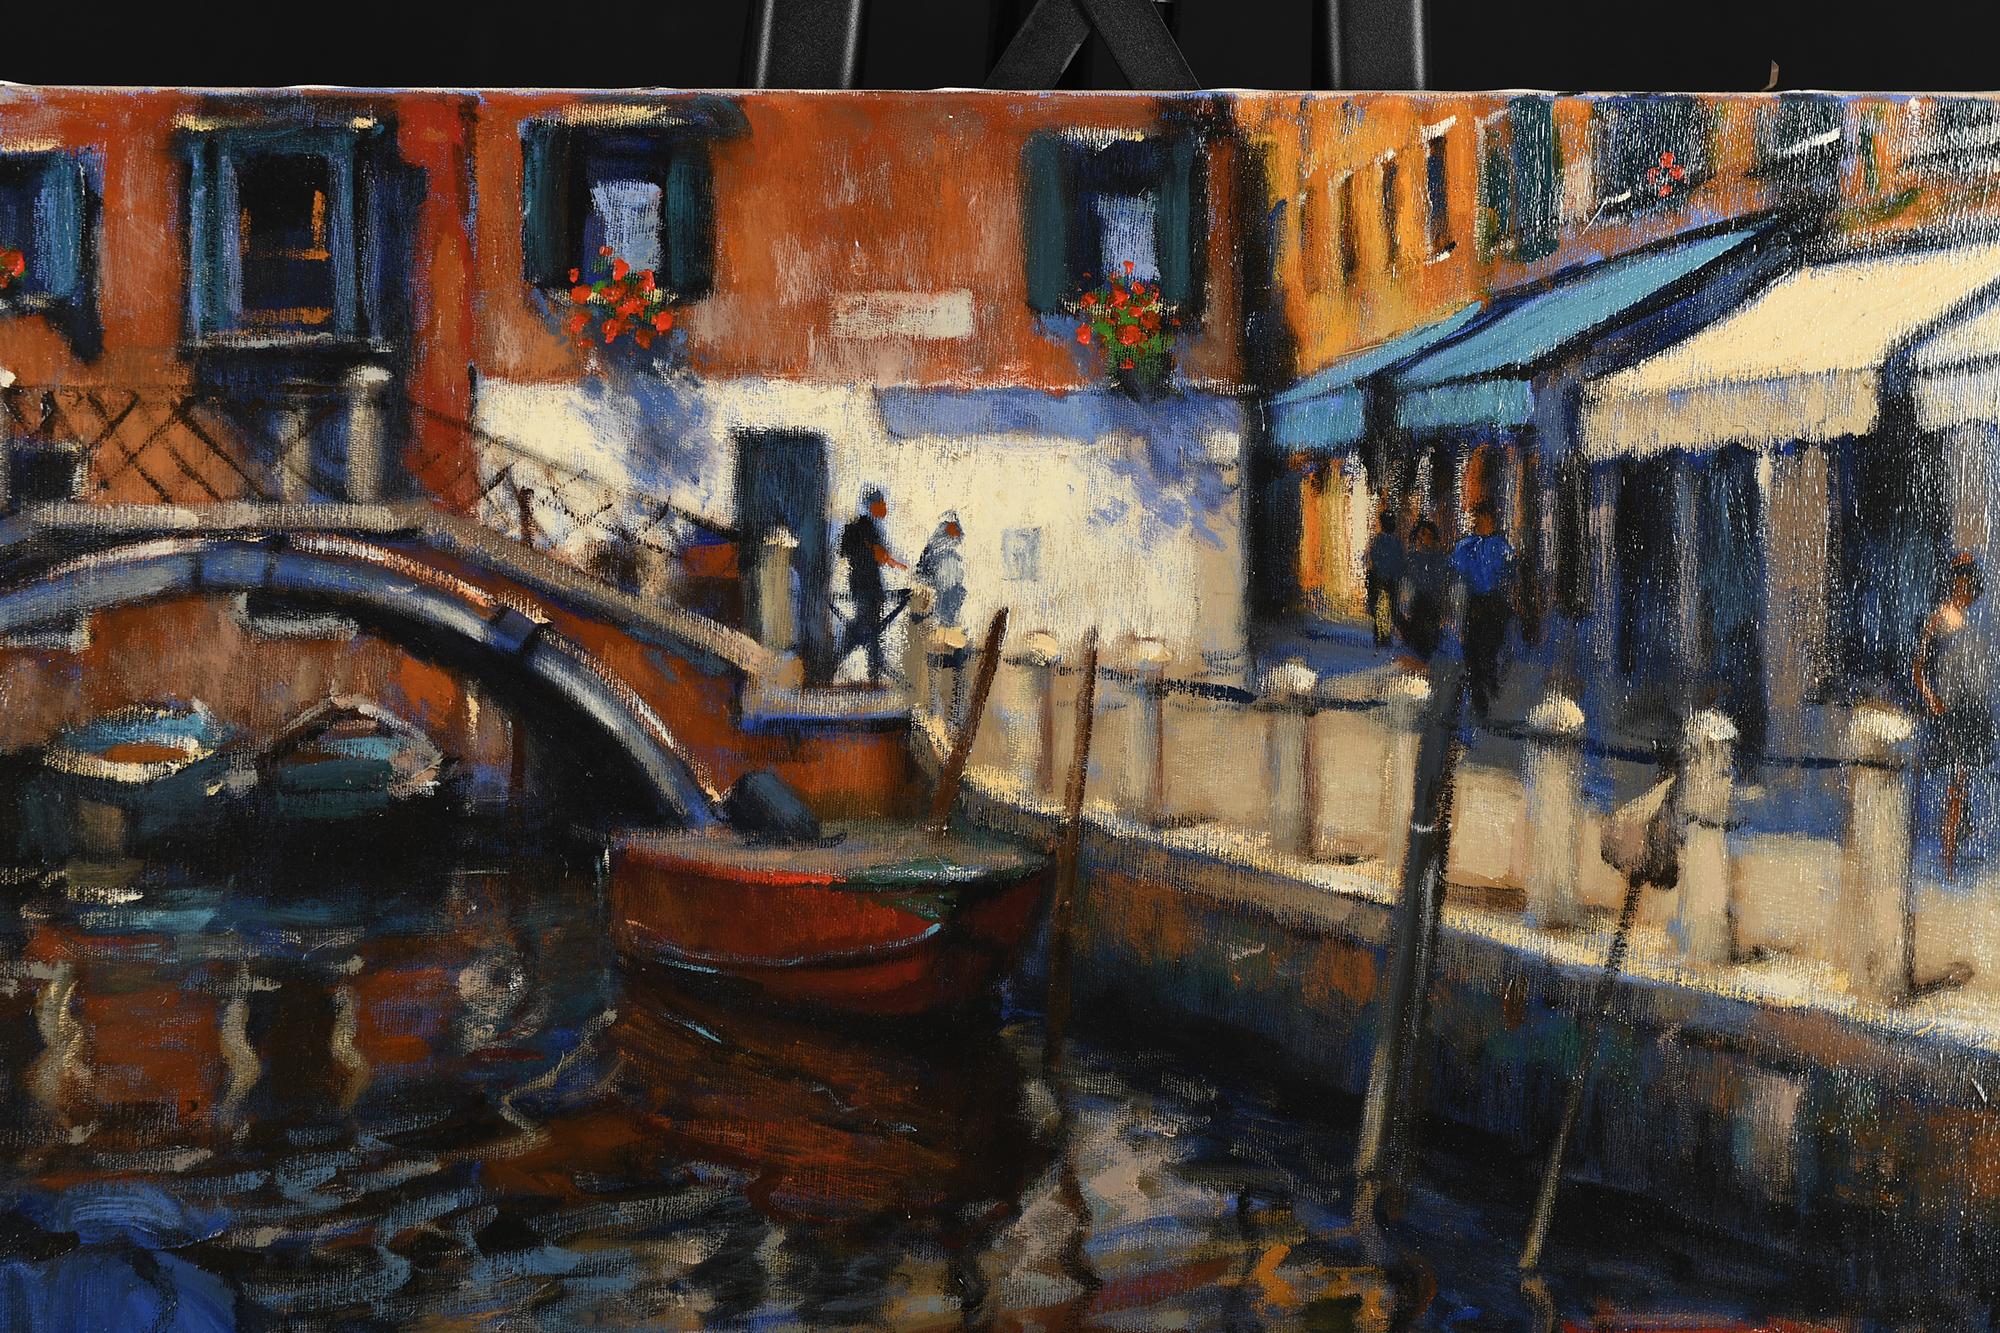 John Mackie original Painting - Image 2 of 6